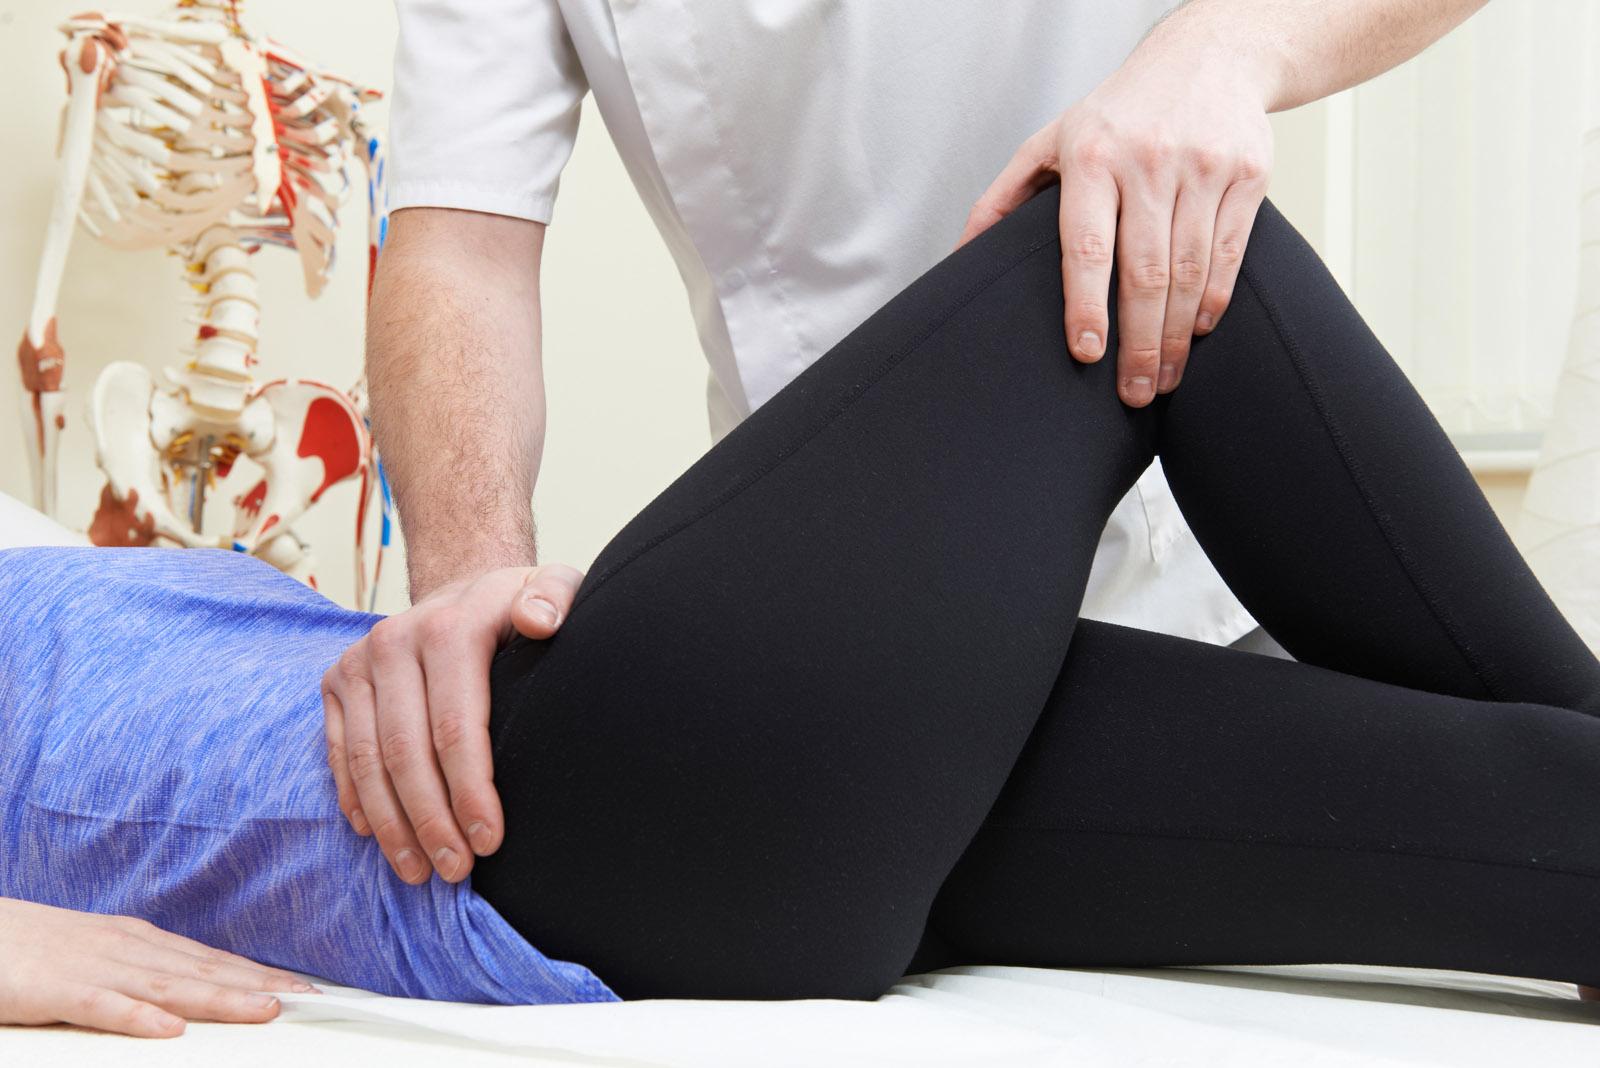 Hip and pelvis discomfort